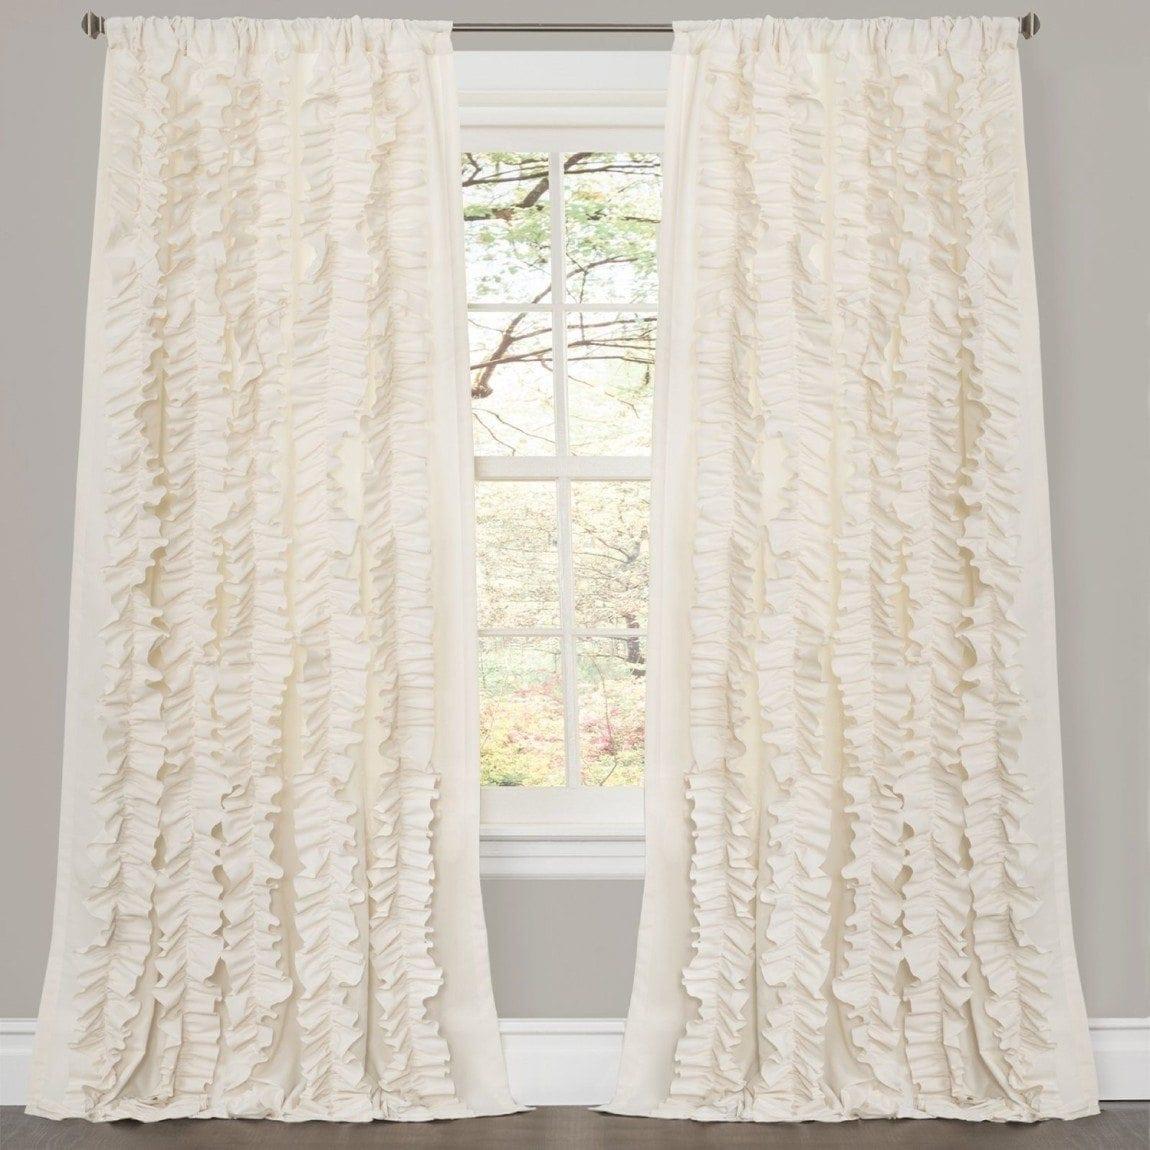 Lush Decor Belle Window Curtain, Ivory